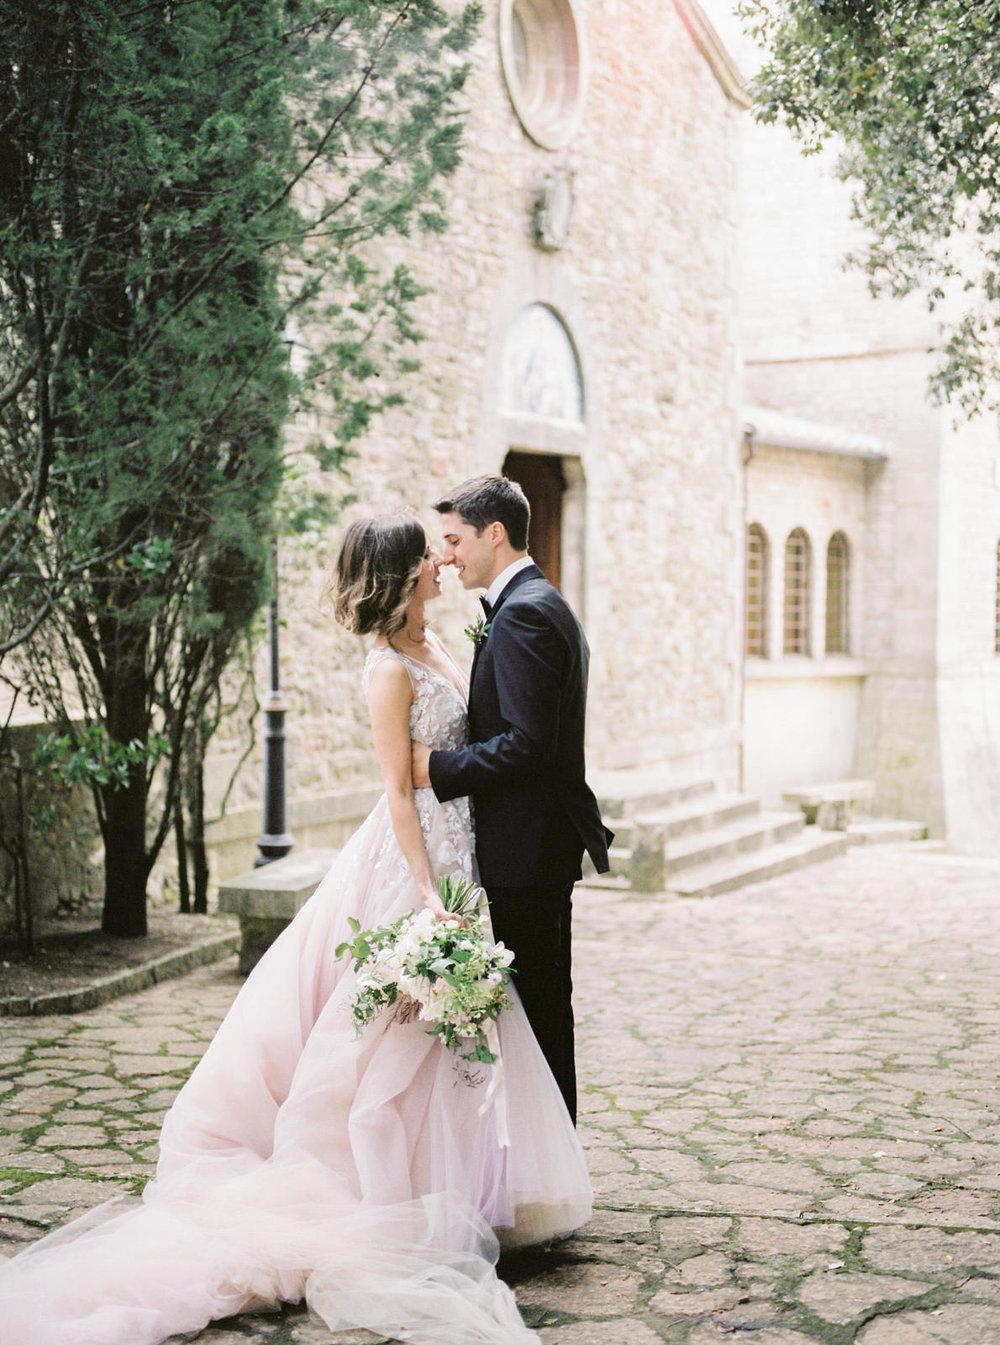 SECLUDED villa wedding   tuscany, italy